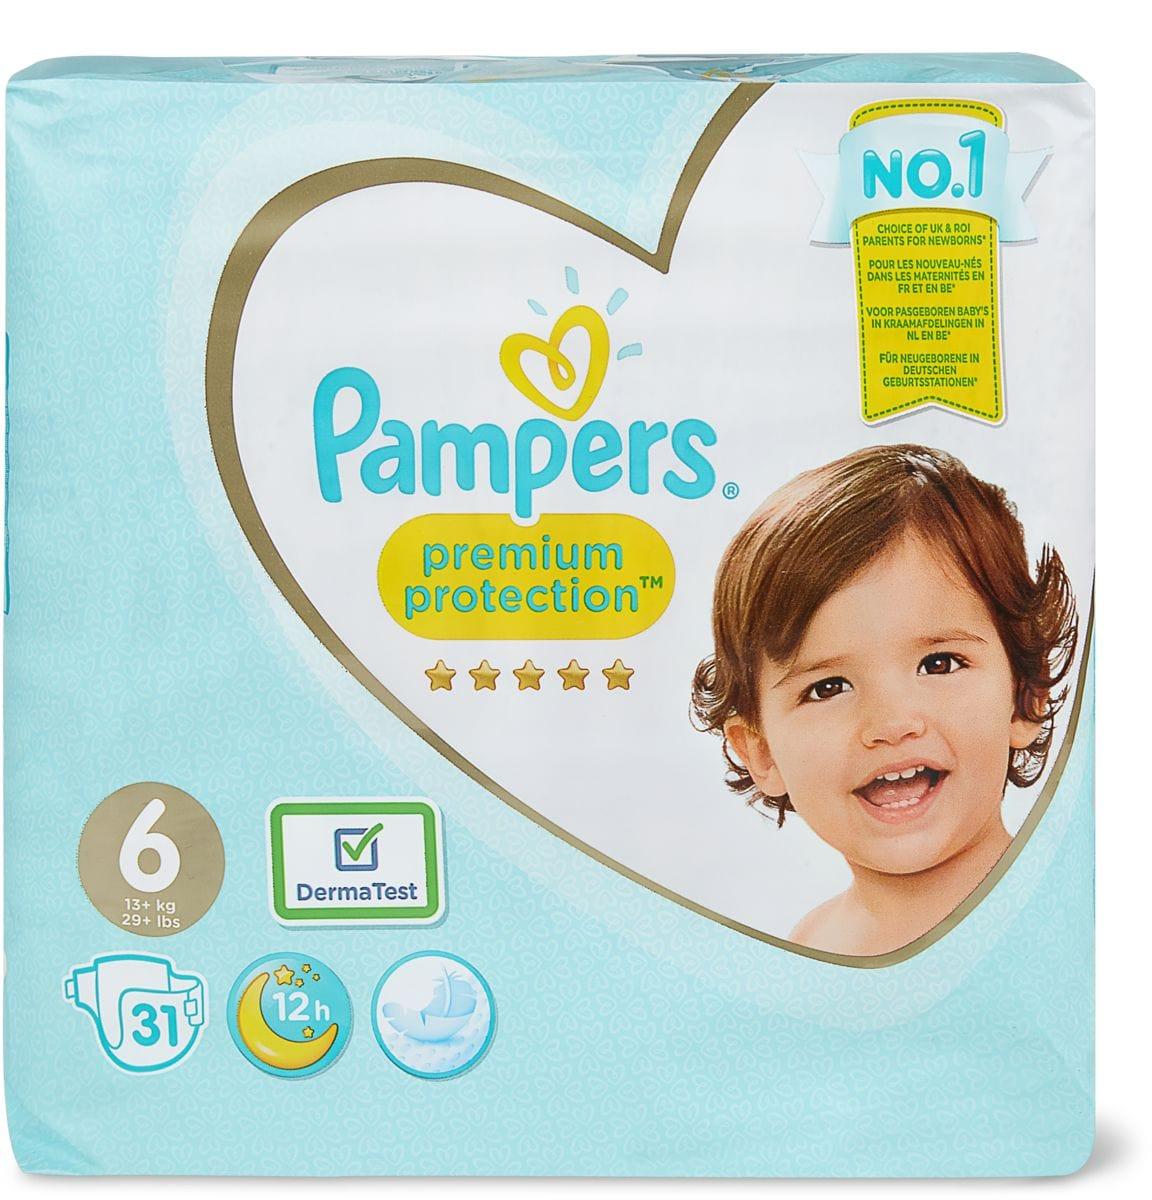 Pampers Premium Protection Gr. 6 XL, 13-18kg